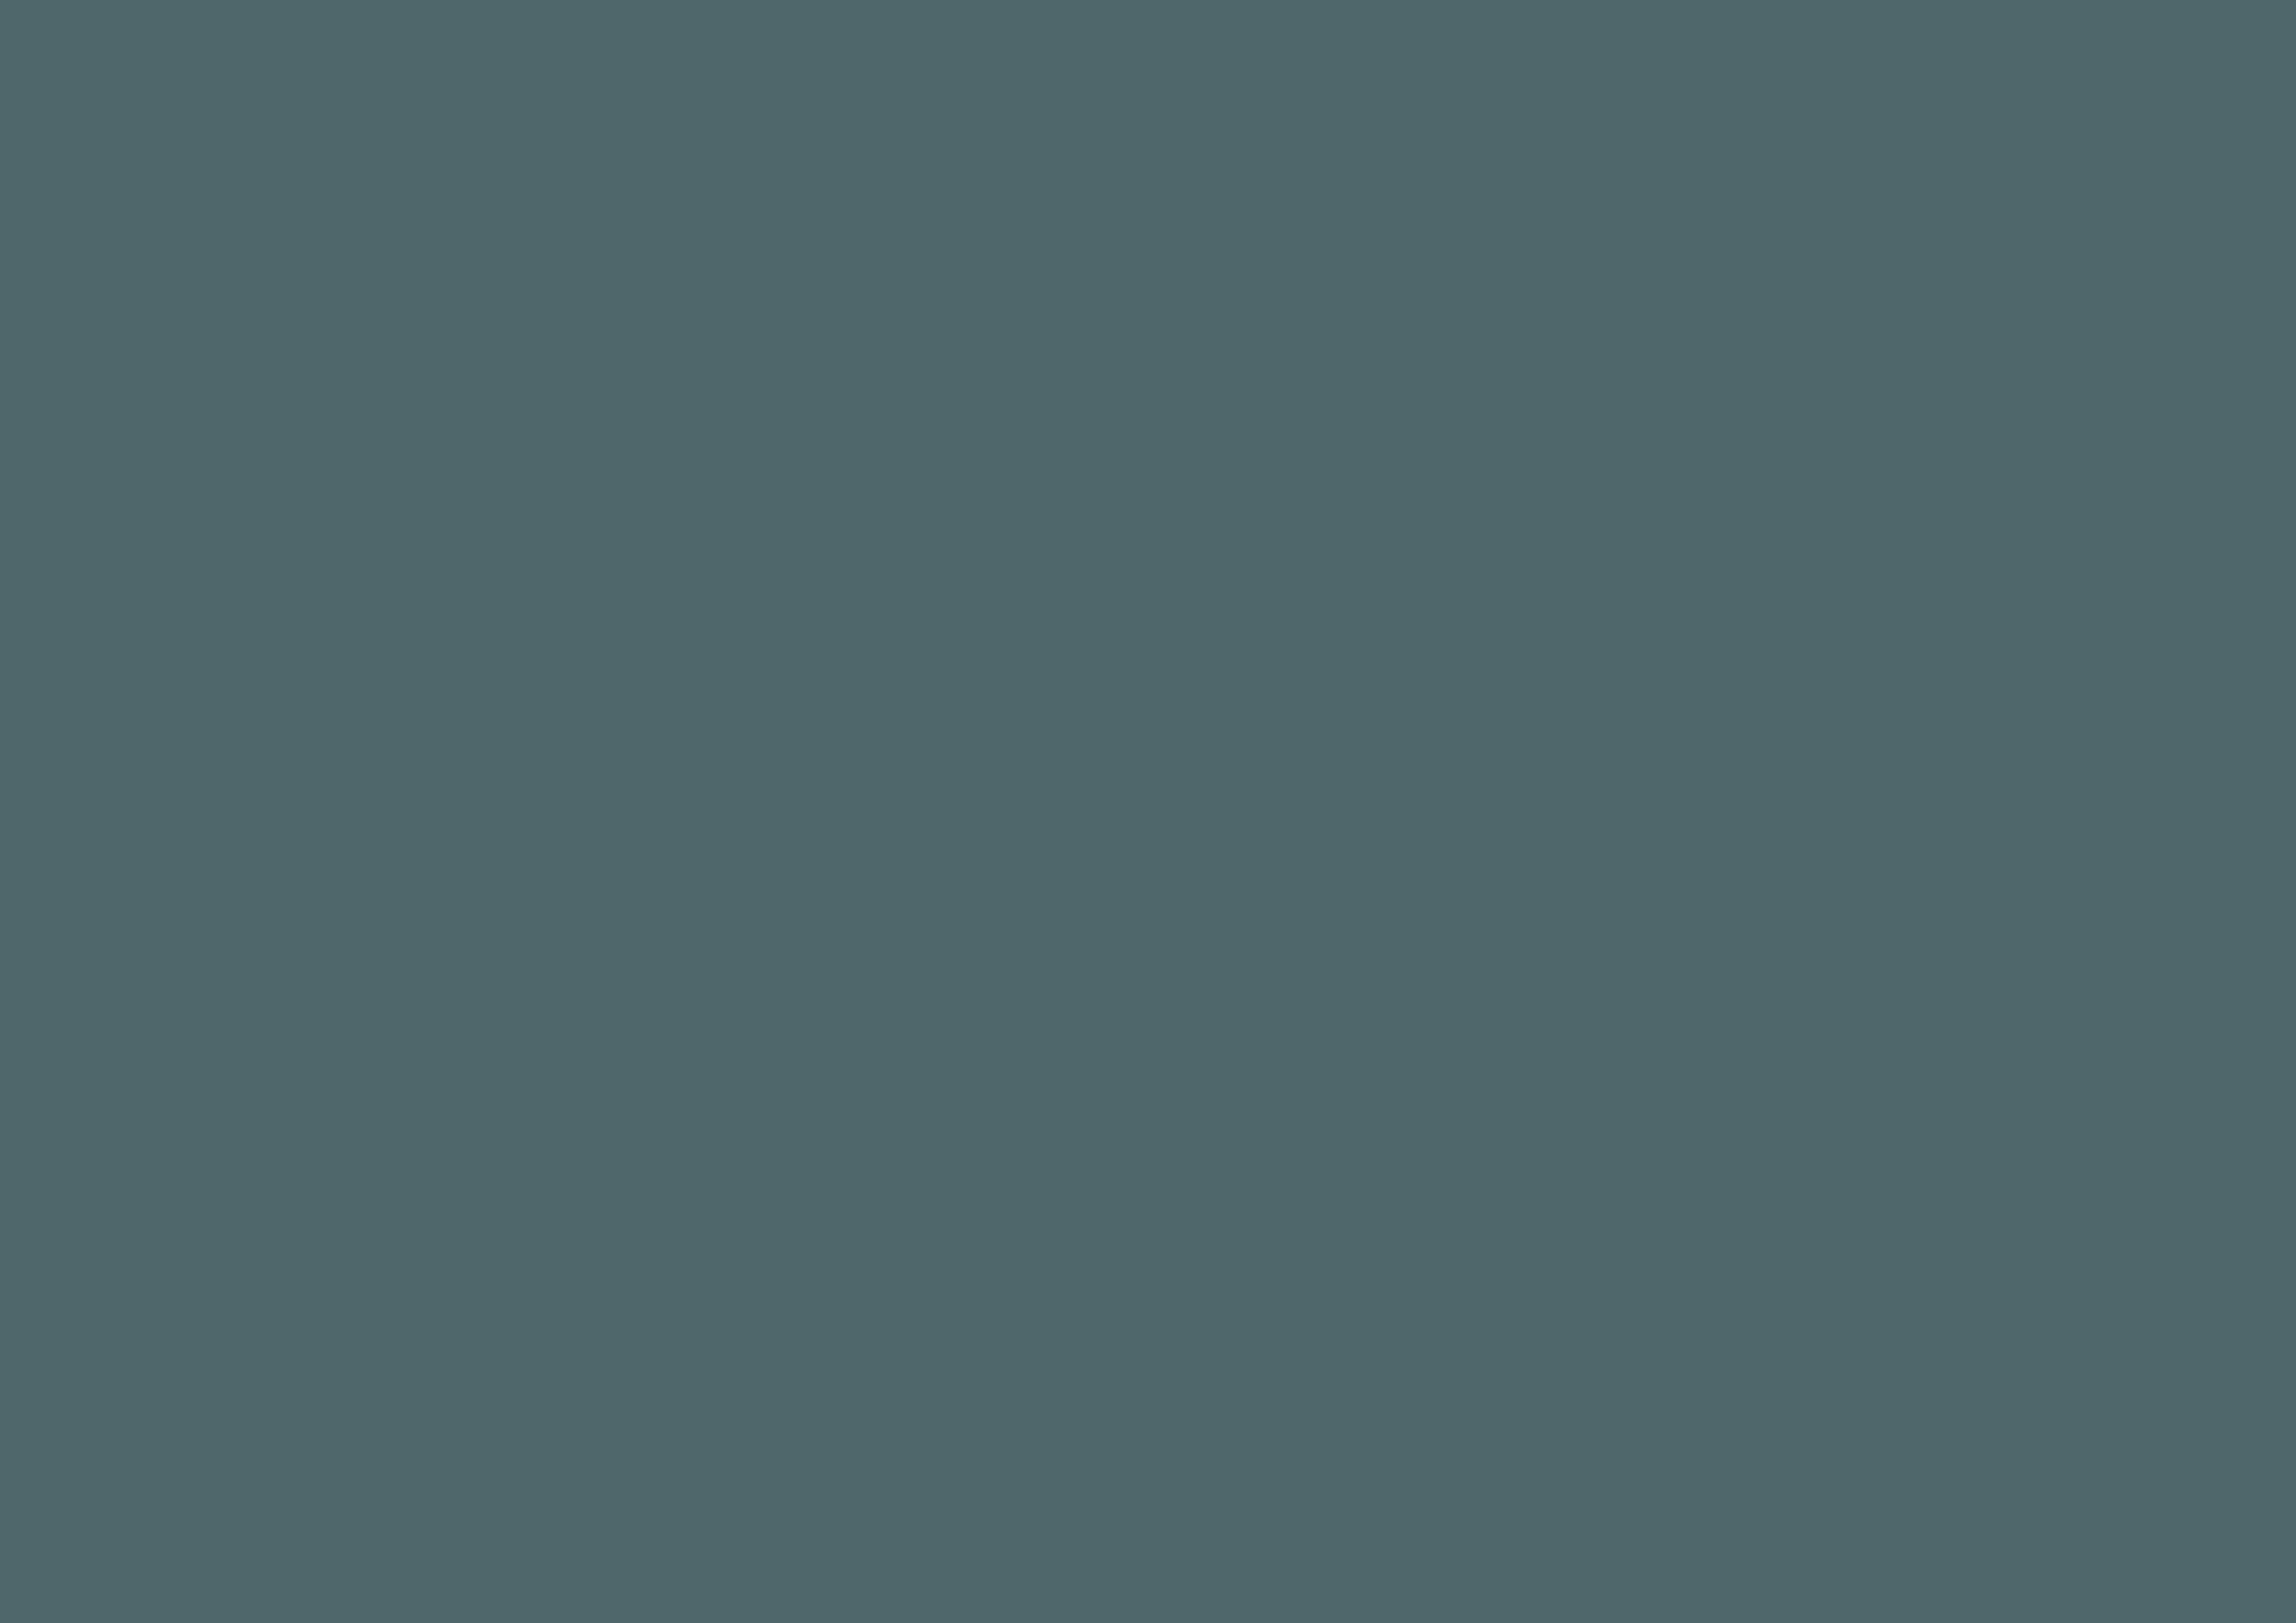 3508x2480 Stormcloud Solid Color Background